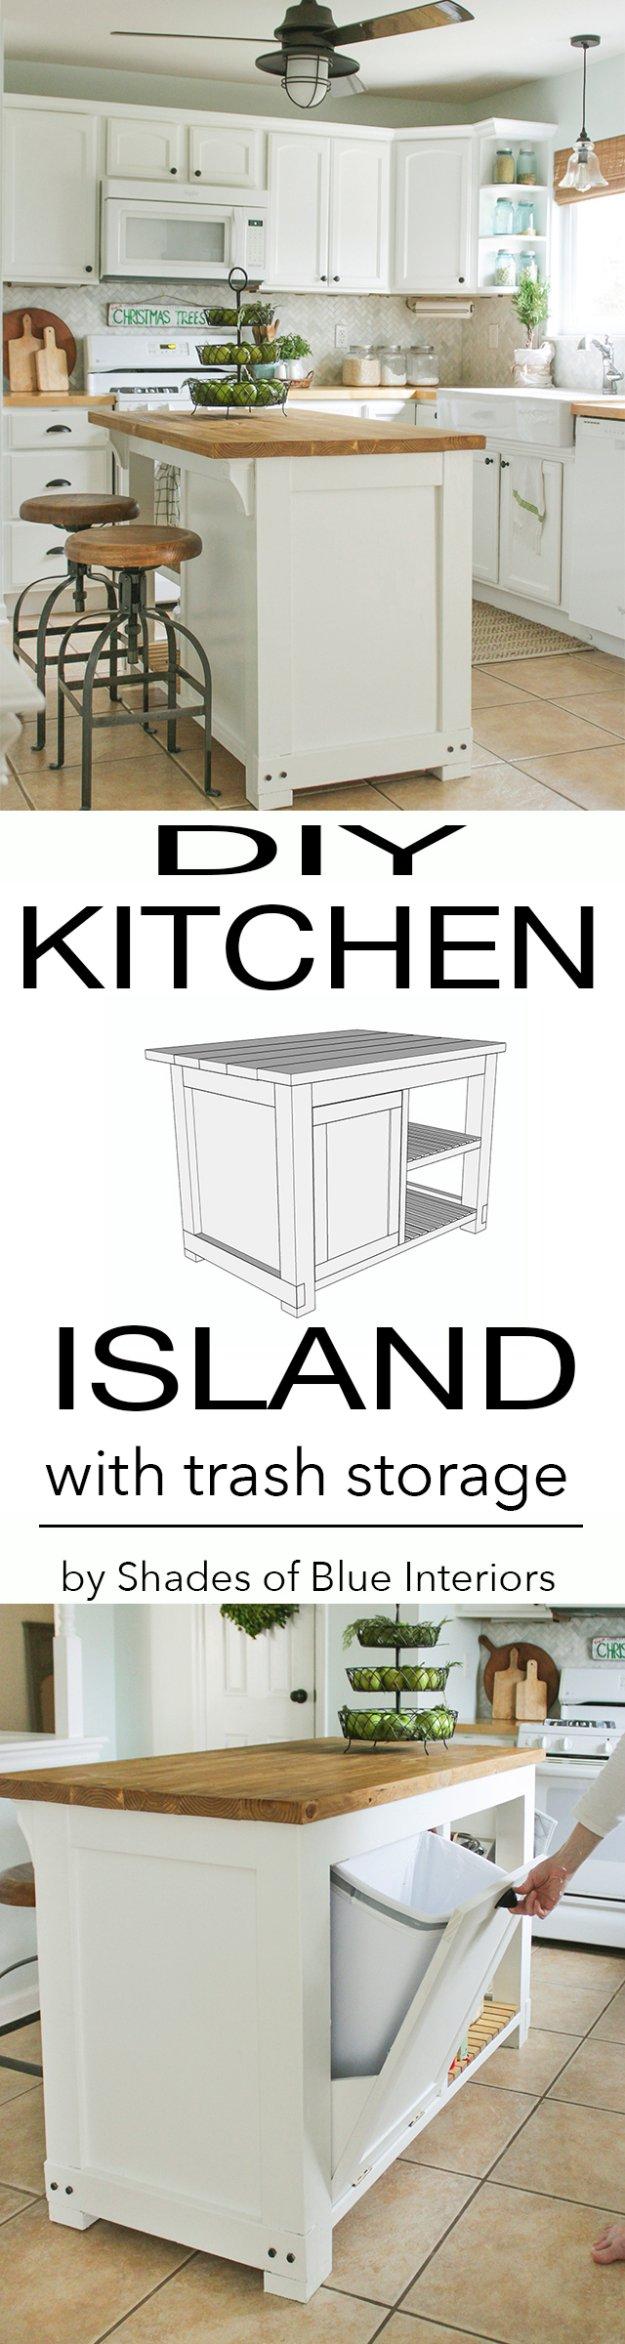 diy kitchen decor ideas diy kitchen ideas DIY Kitchen Decor Ideas DIY Kitchen Island With Trash Storage Creative Furniture Projects